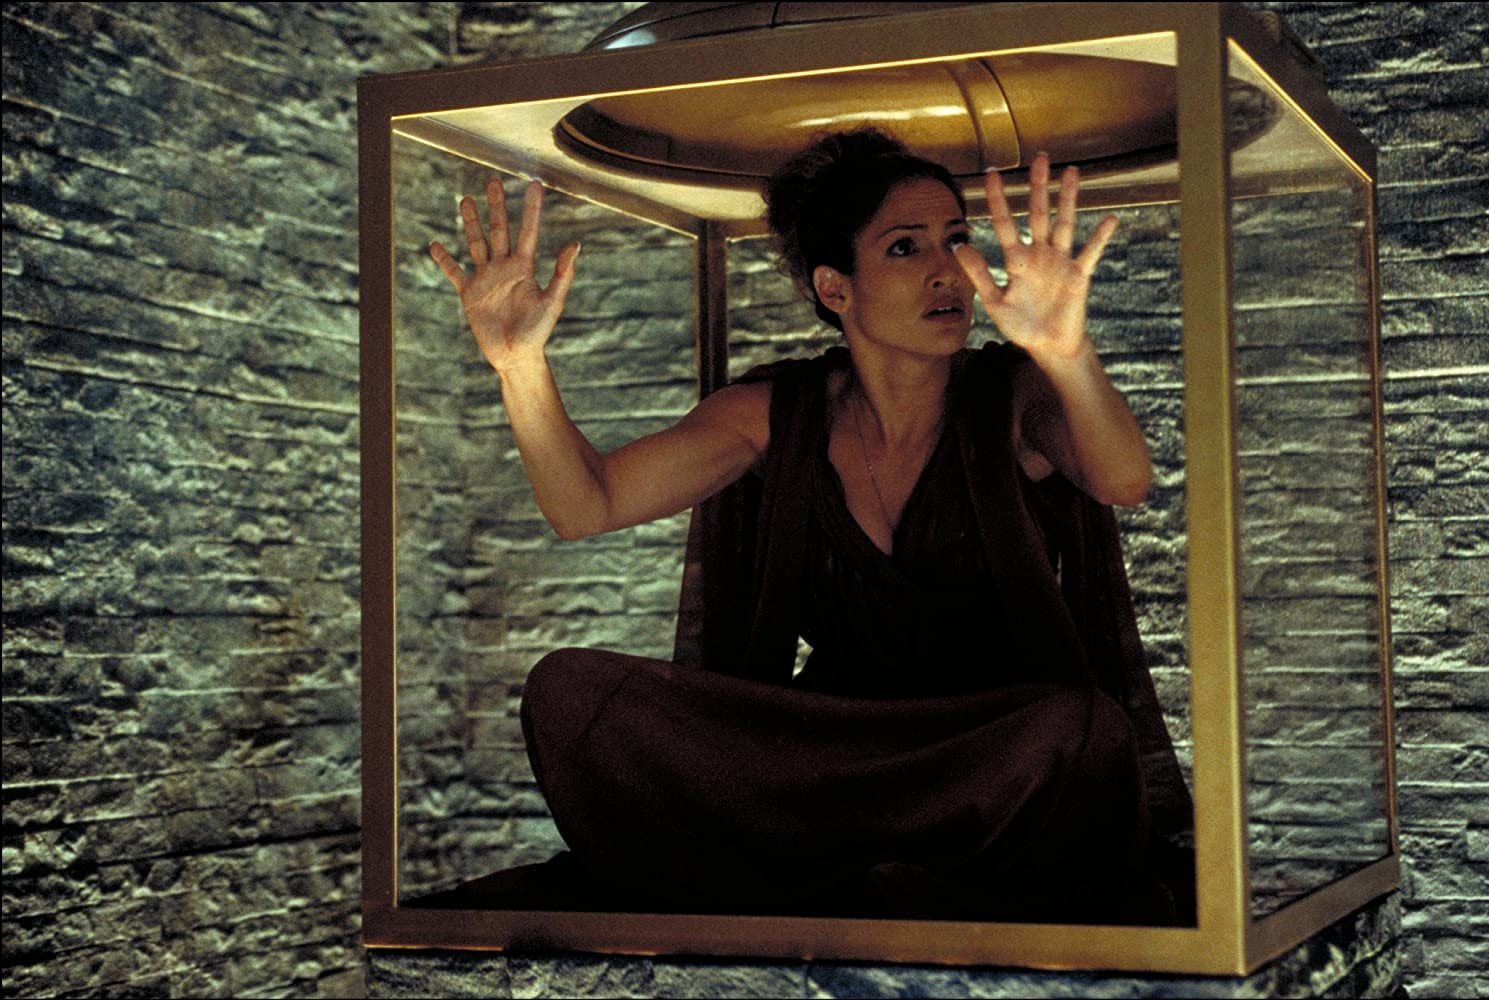 Jennifer Lopez in The Cell (2000)